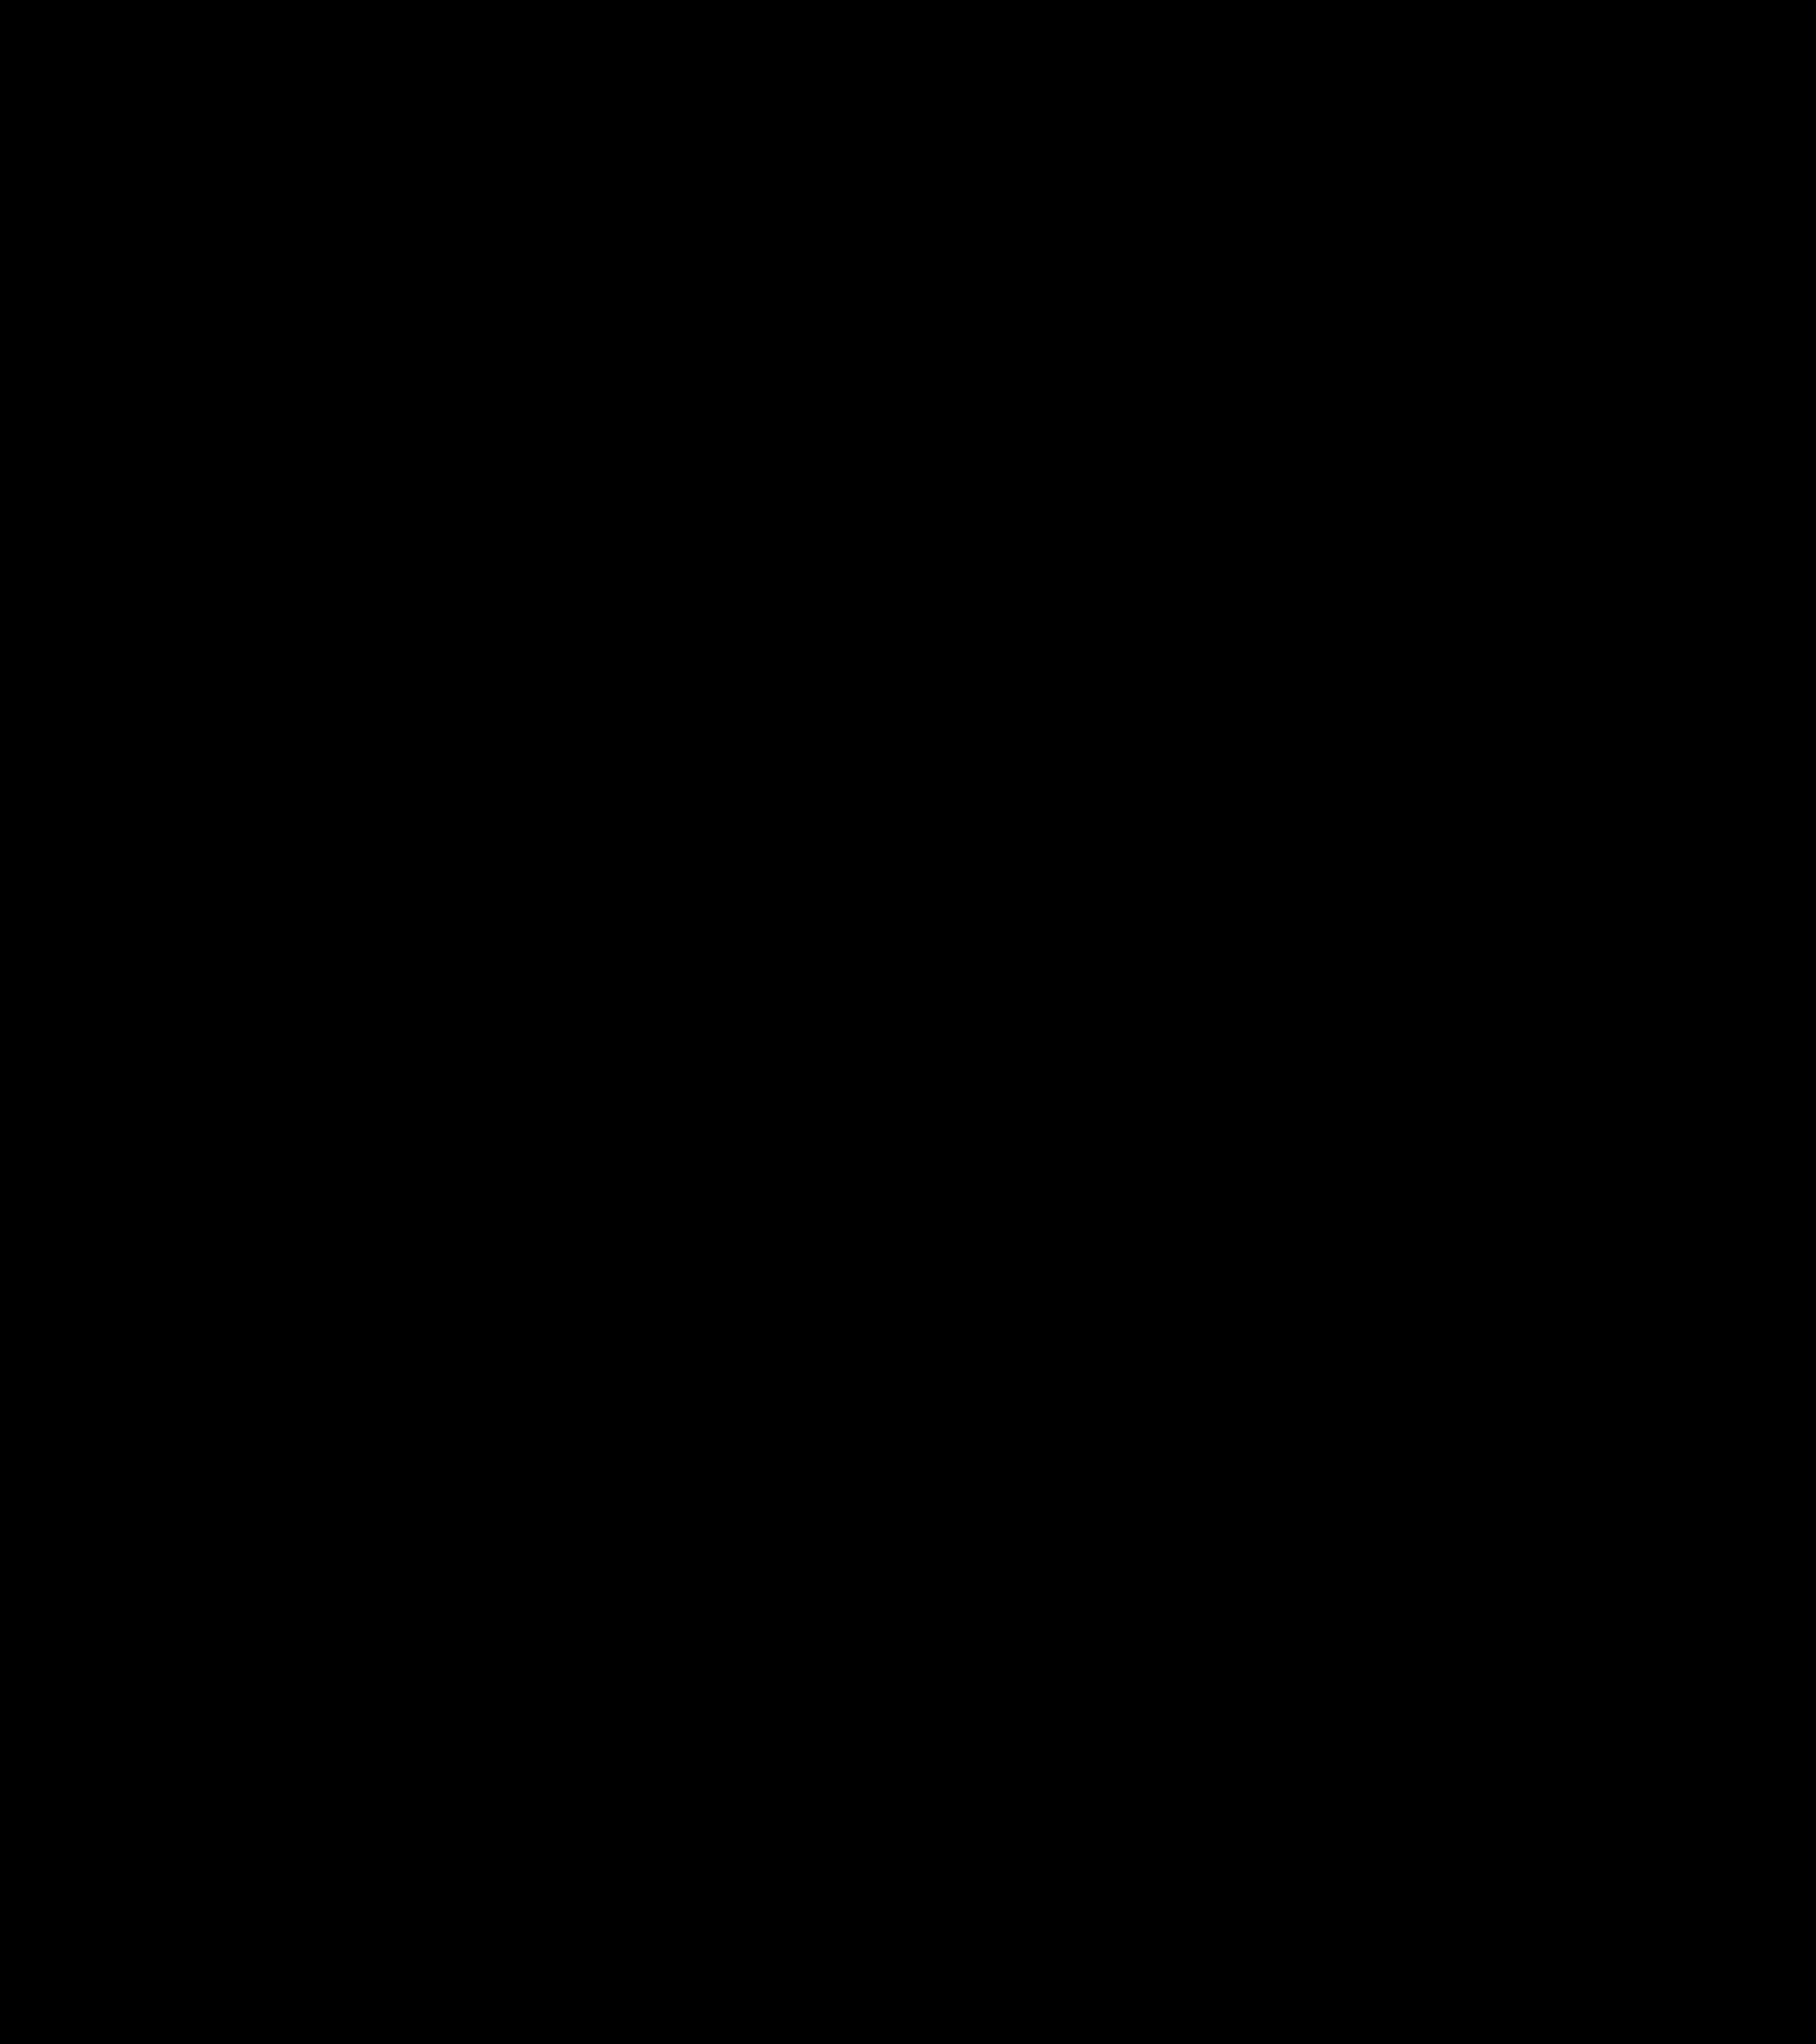 Rocketship clipart black and white, Rocketship black and ...